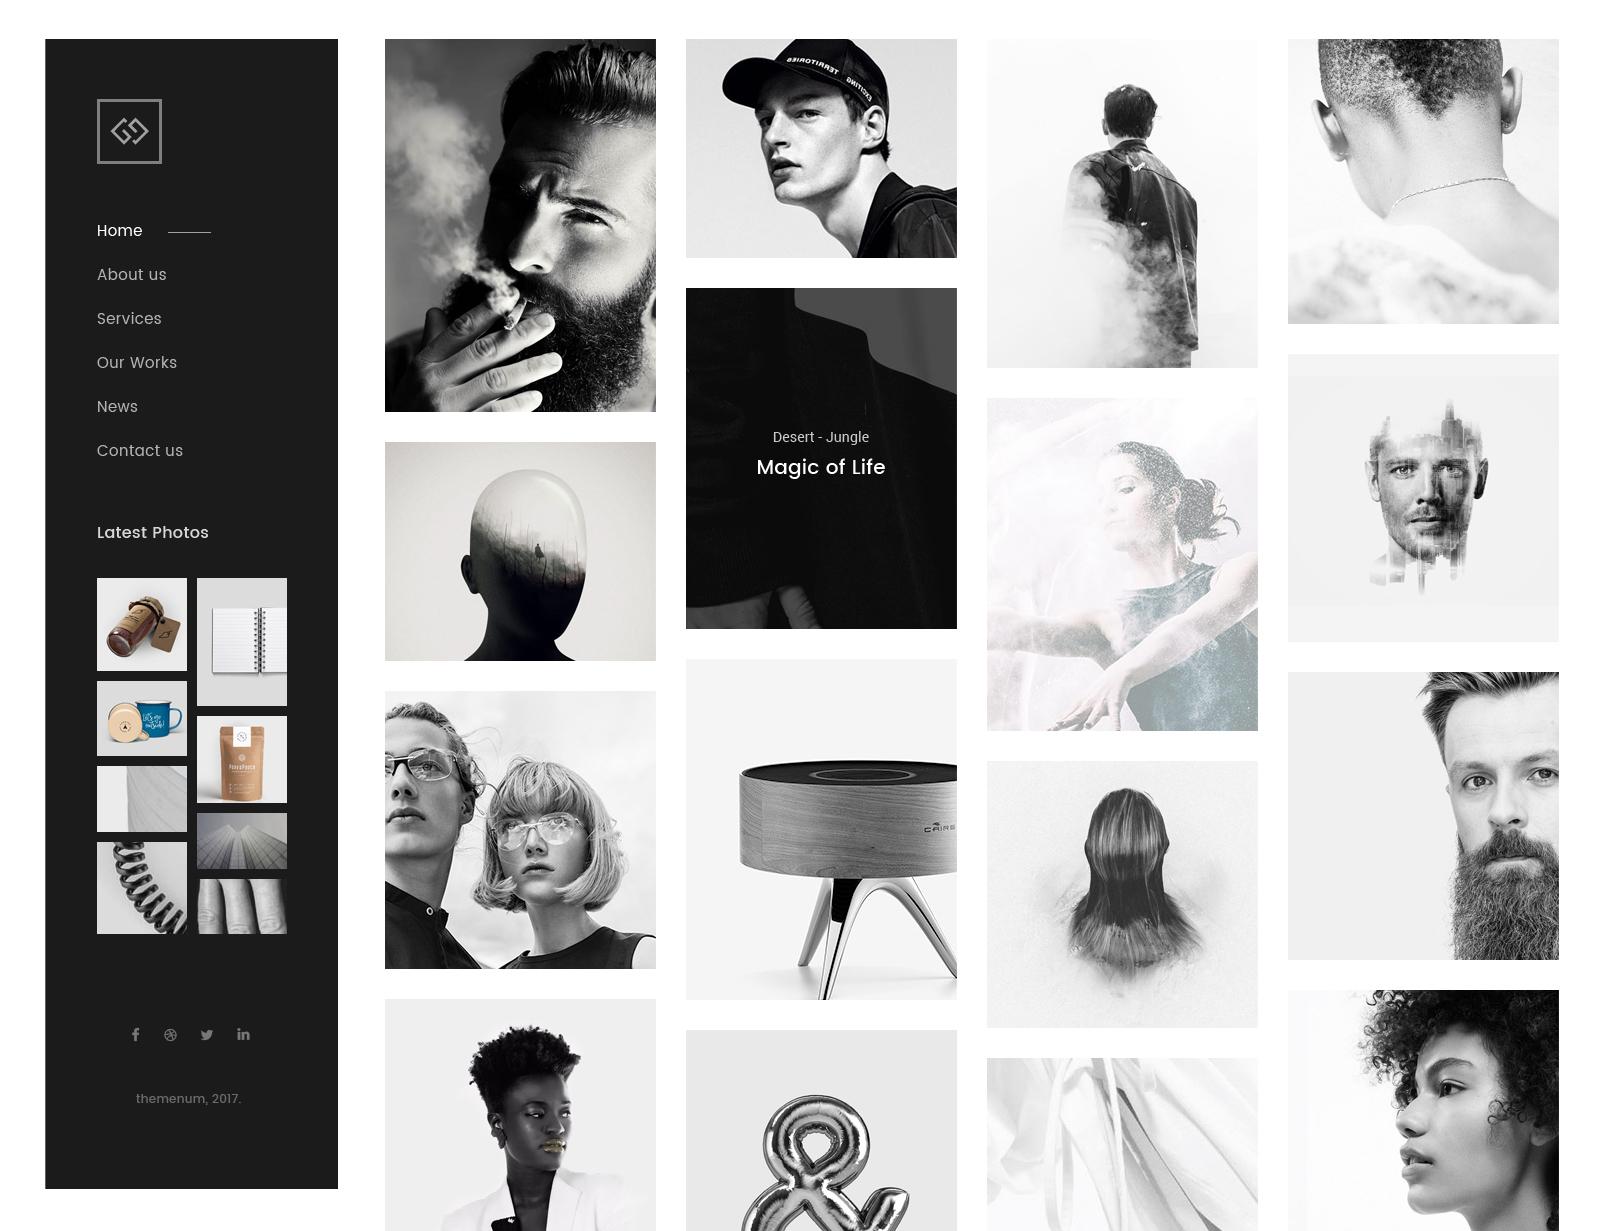 BAB - Creative Minimal Portfolio & Agency PSD Template by themenum